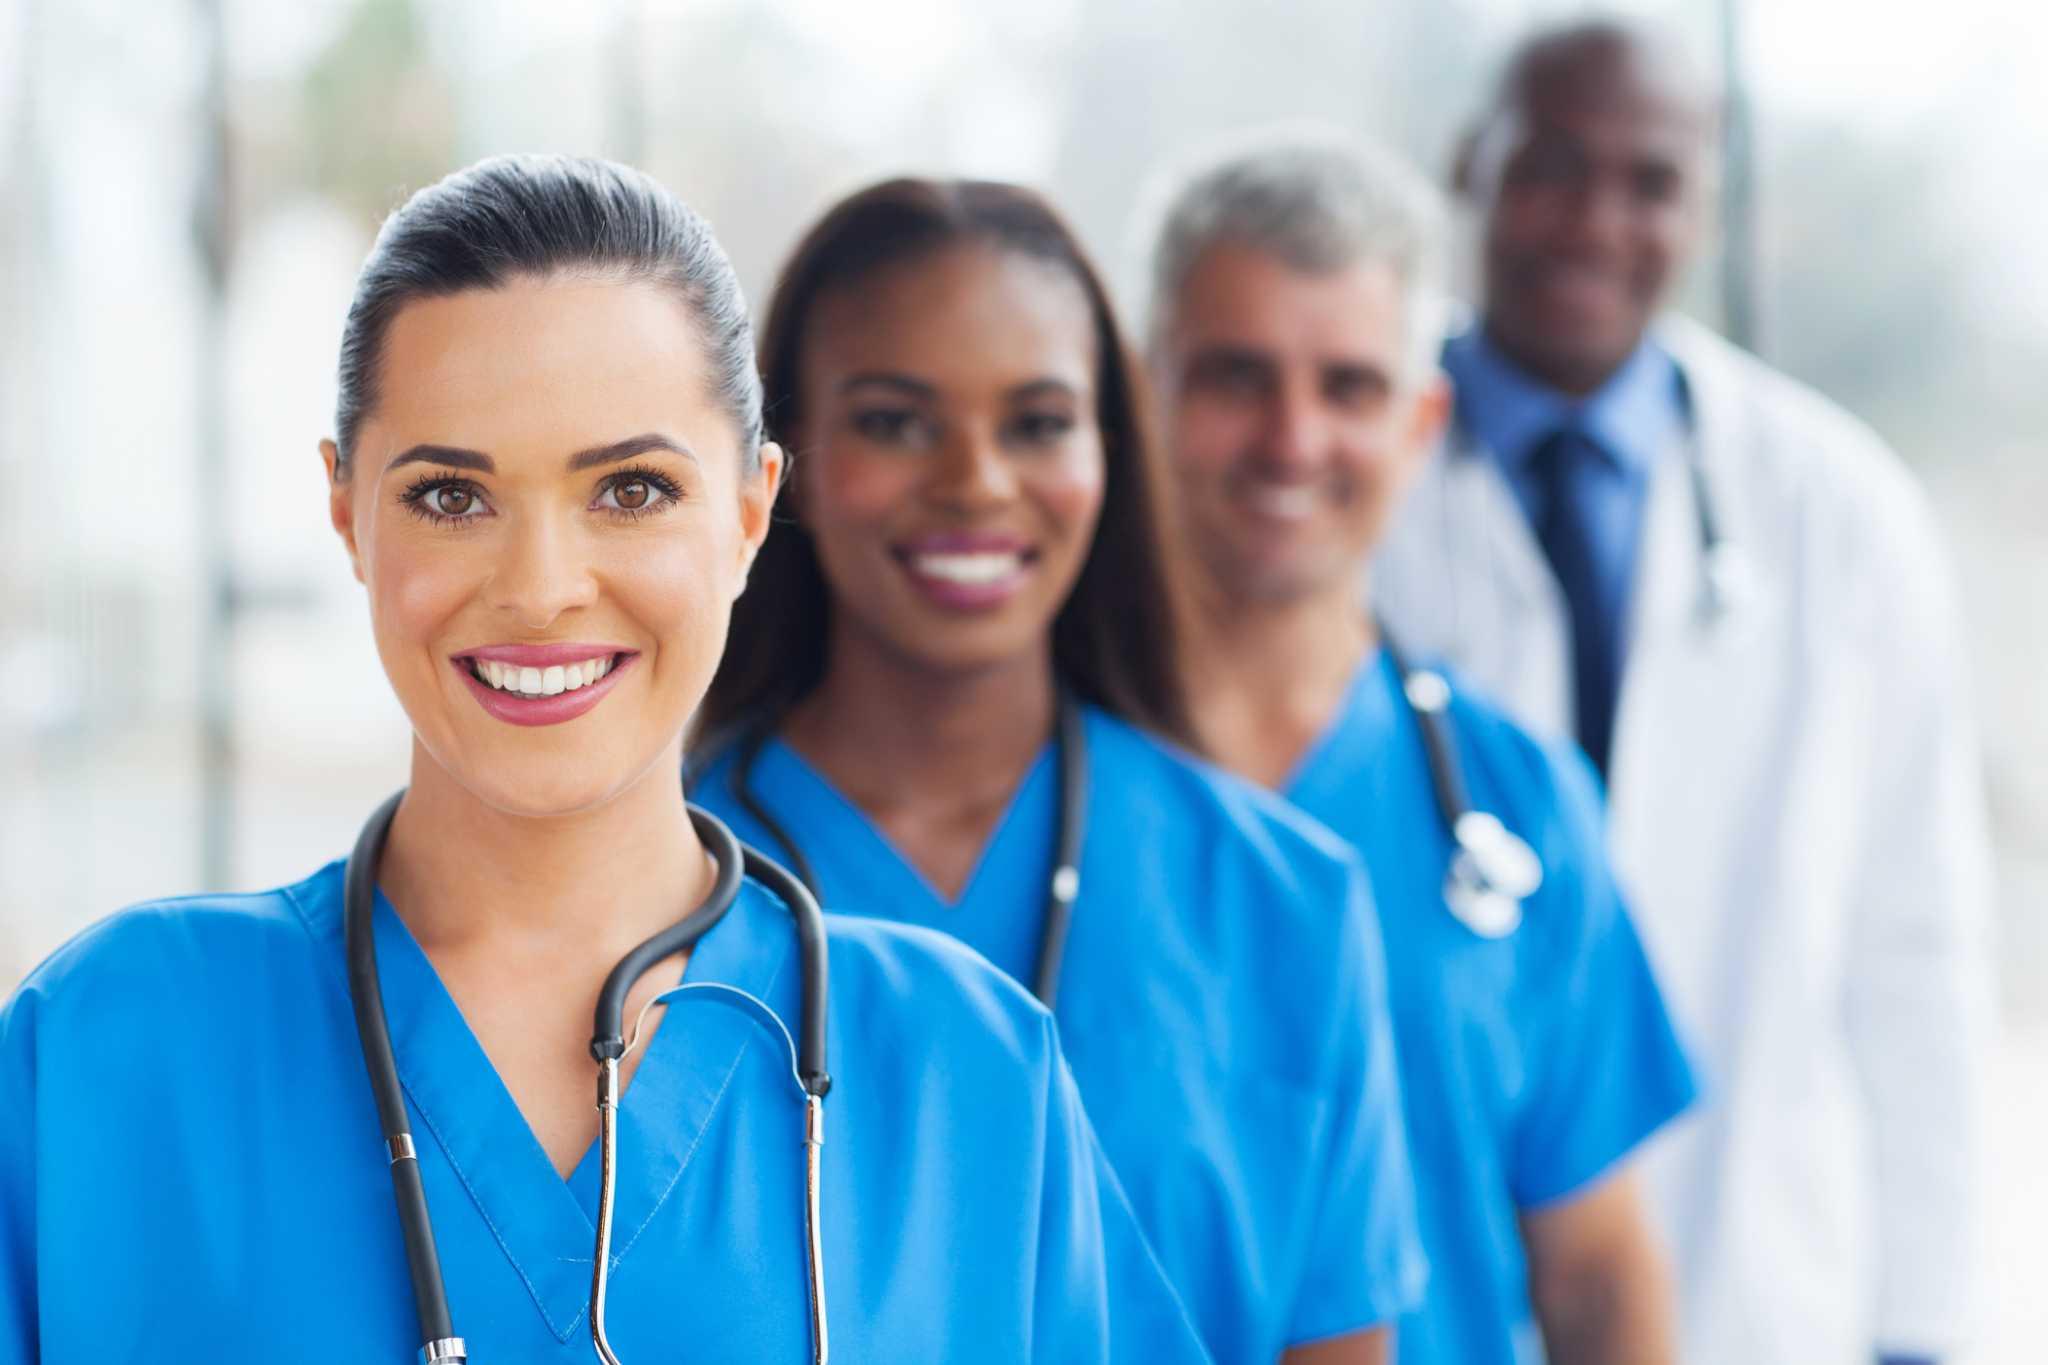 hca healthcare gulf coast division slates hiring events